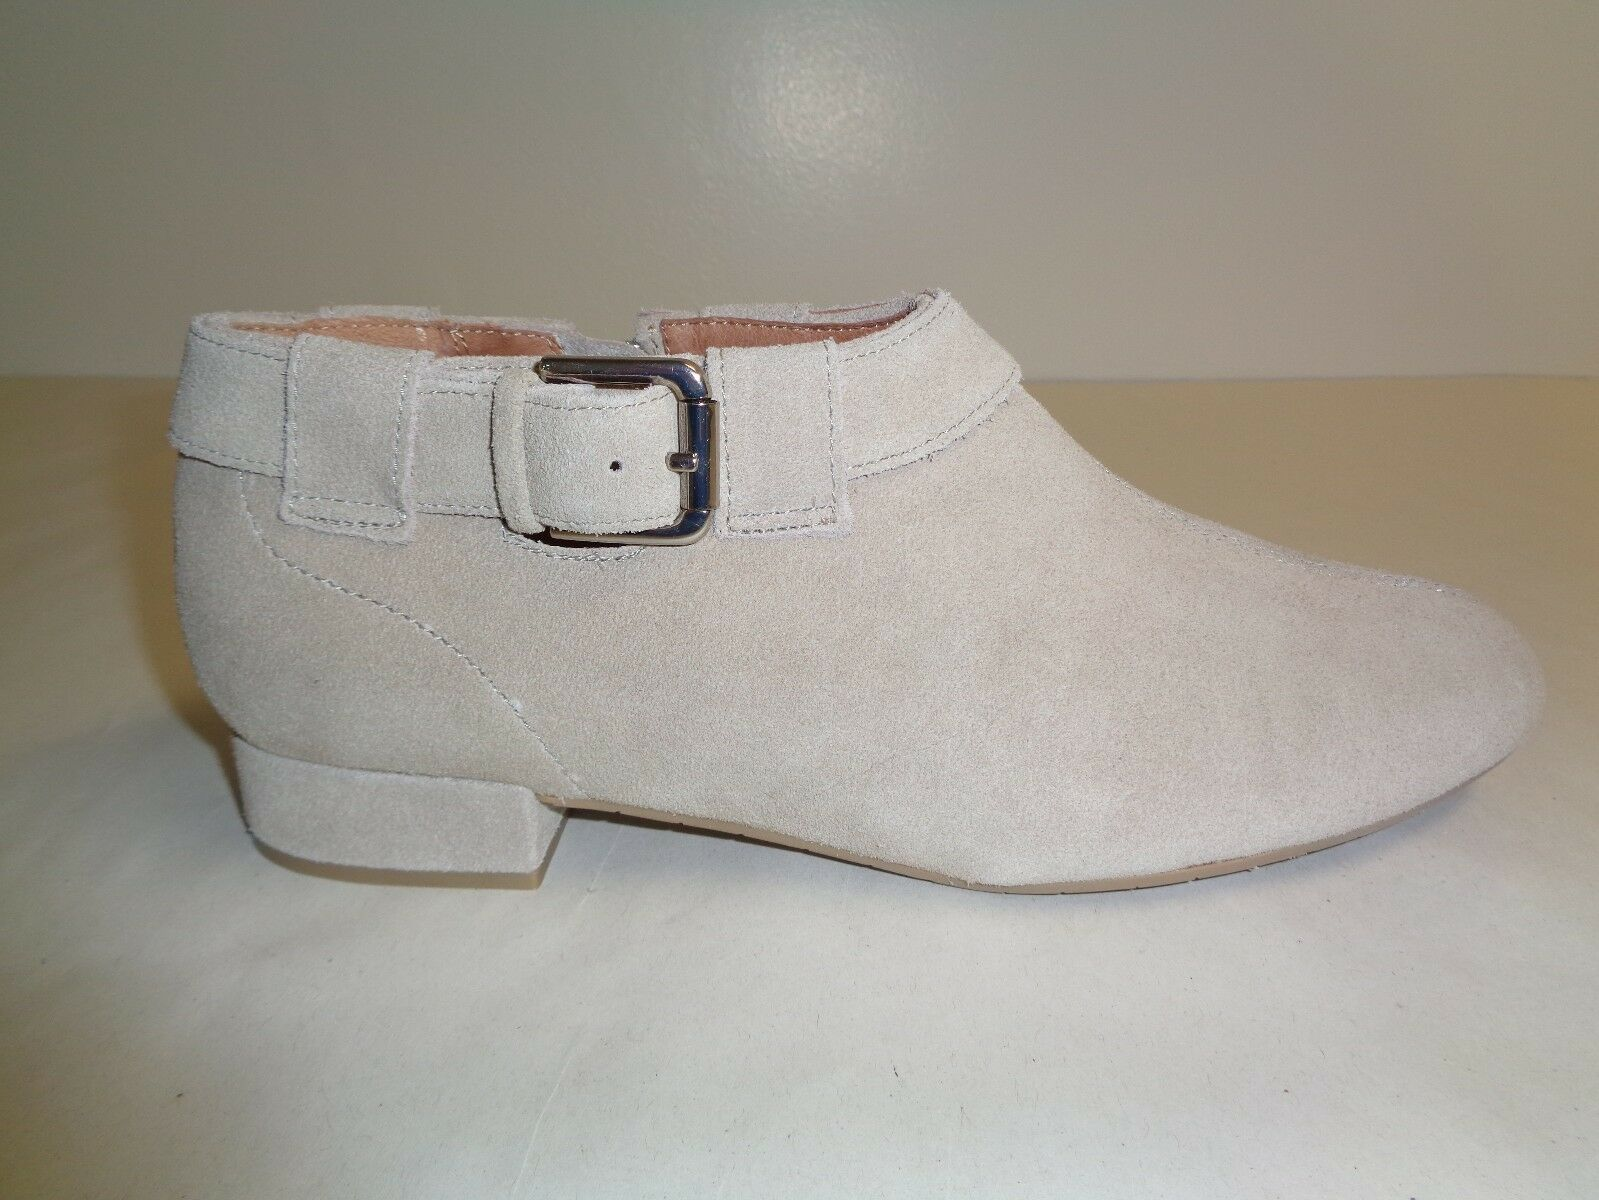 Nina PARCHUomoT Size 7.5 DRENA PARCHUomoT Nina SPORT Tan Suede Ankle